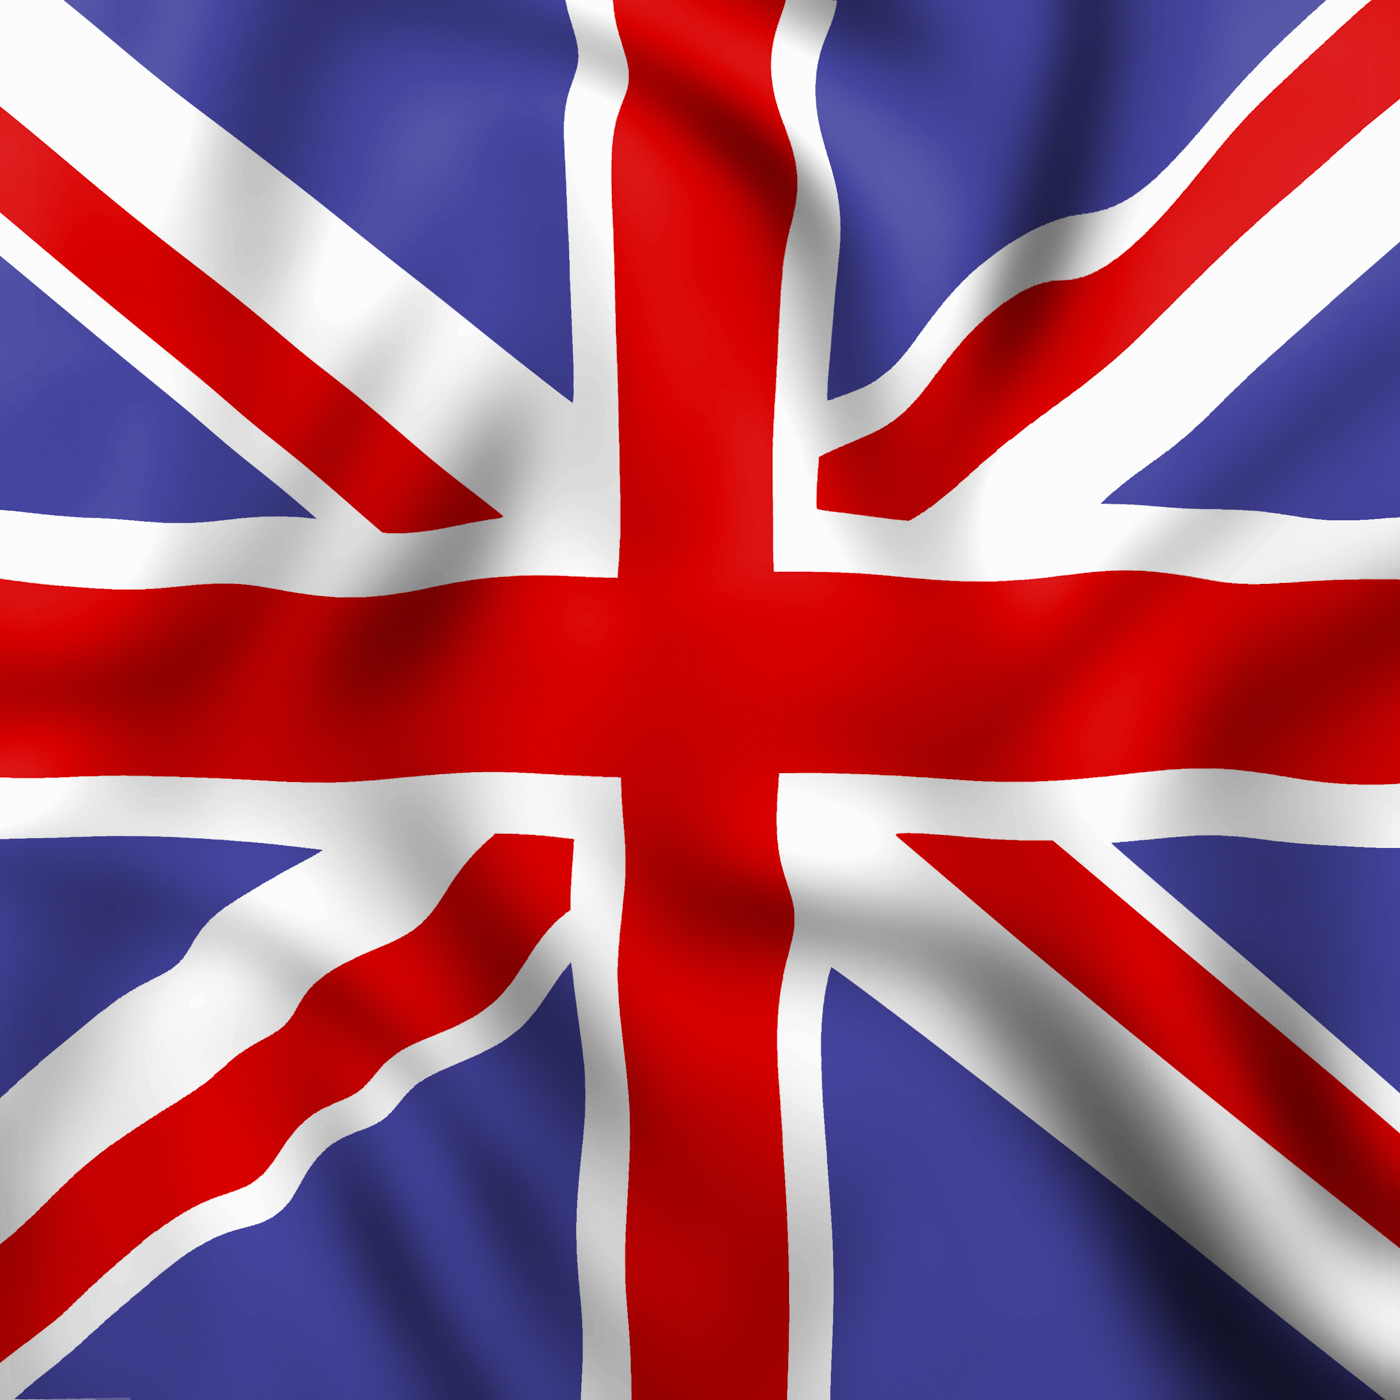 Union Jack Indicates English Flag And Britain, Abstract, Kingdom, United, Unionjack, HQ Photo